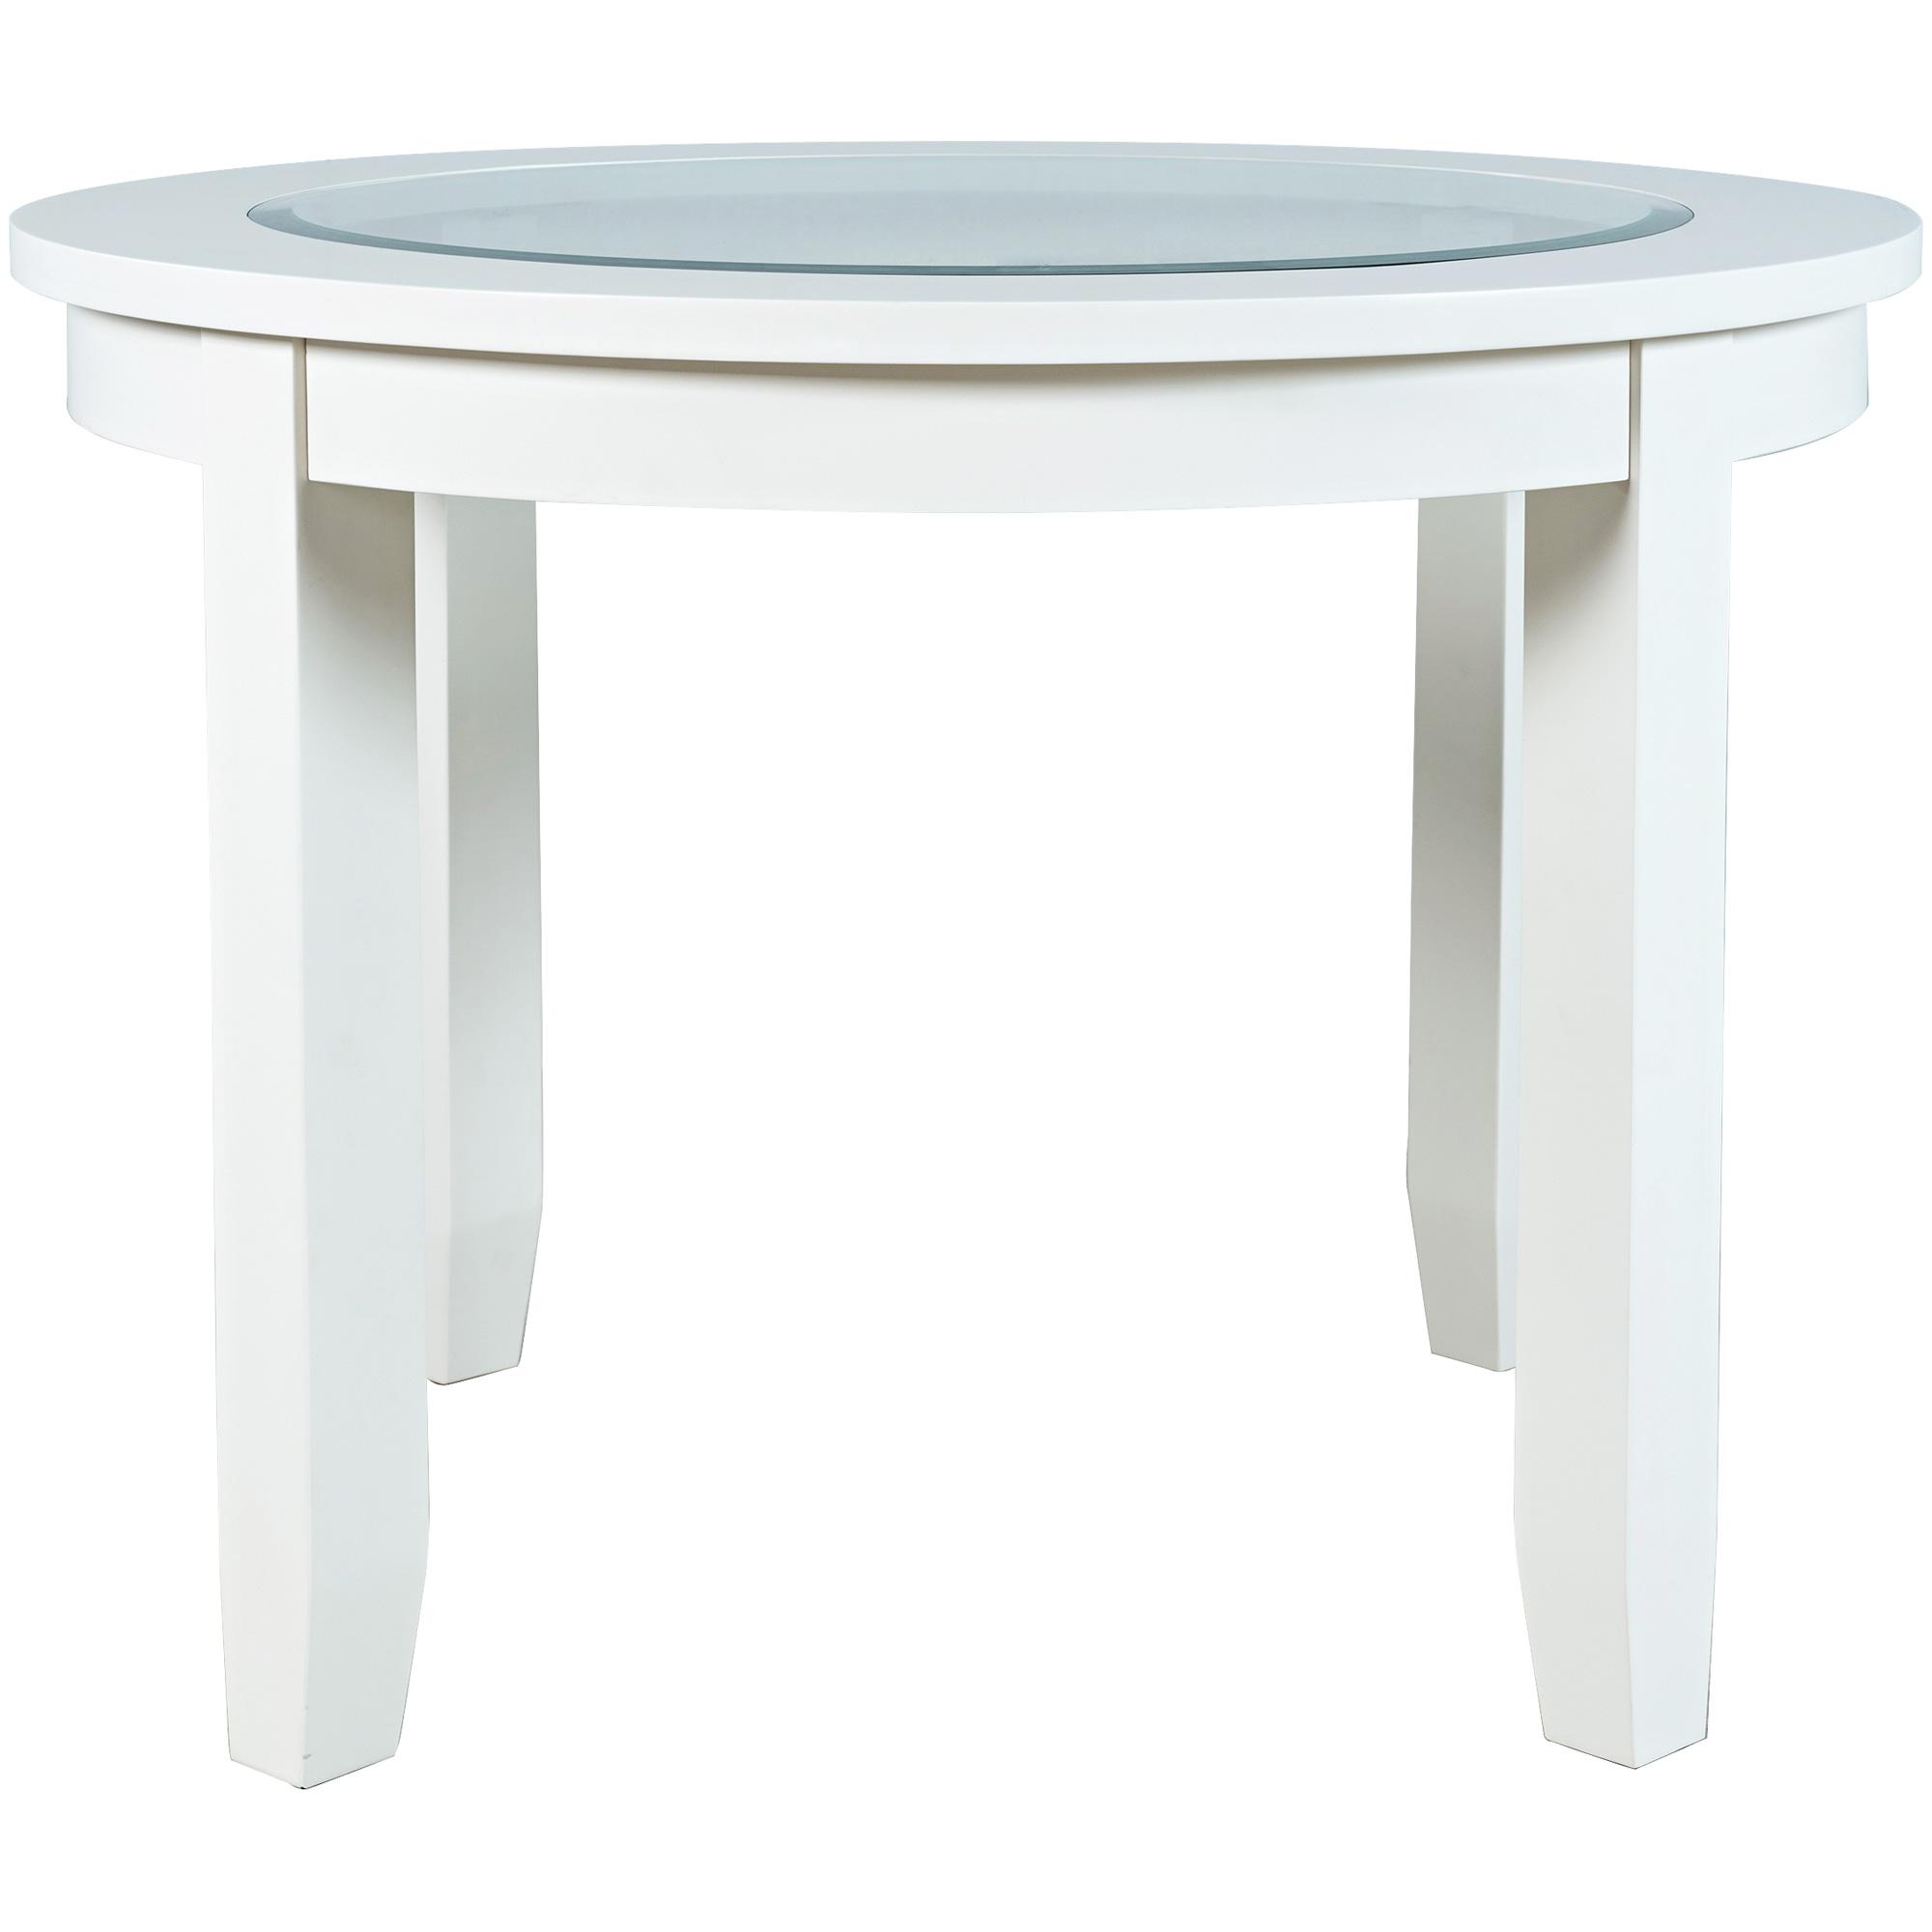 Jofran, Inc. | Urban Icon White Round Dining Table